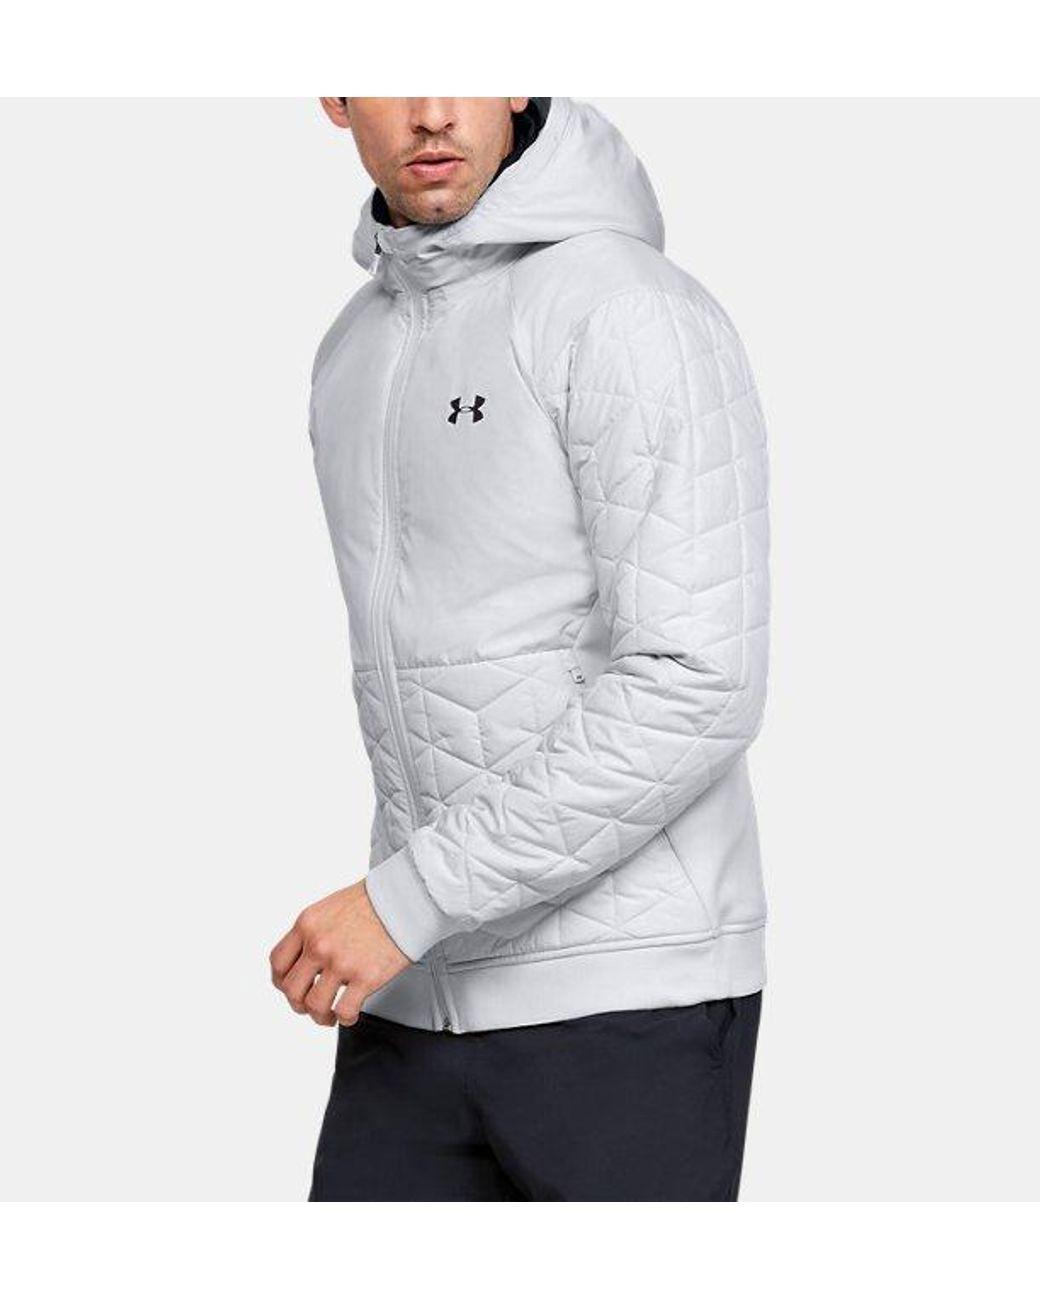 Nike Sportswear Air Hybrid Kapuzenjacke Herren   OTTO